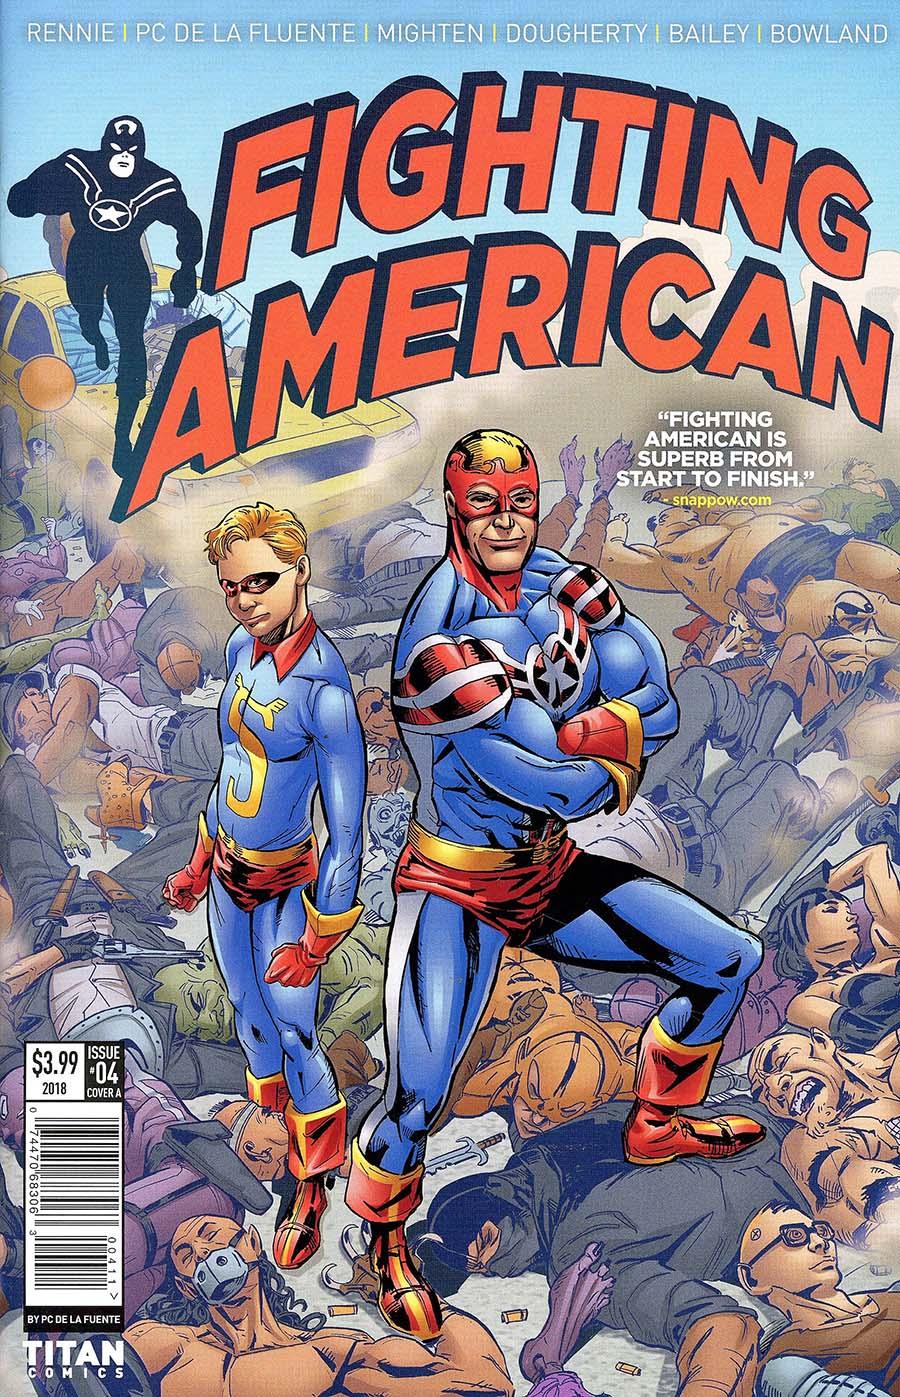 Fighting American Vol 4 #4 Cover A Regular Francisco De La Fuente Cover